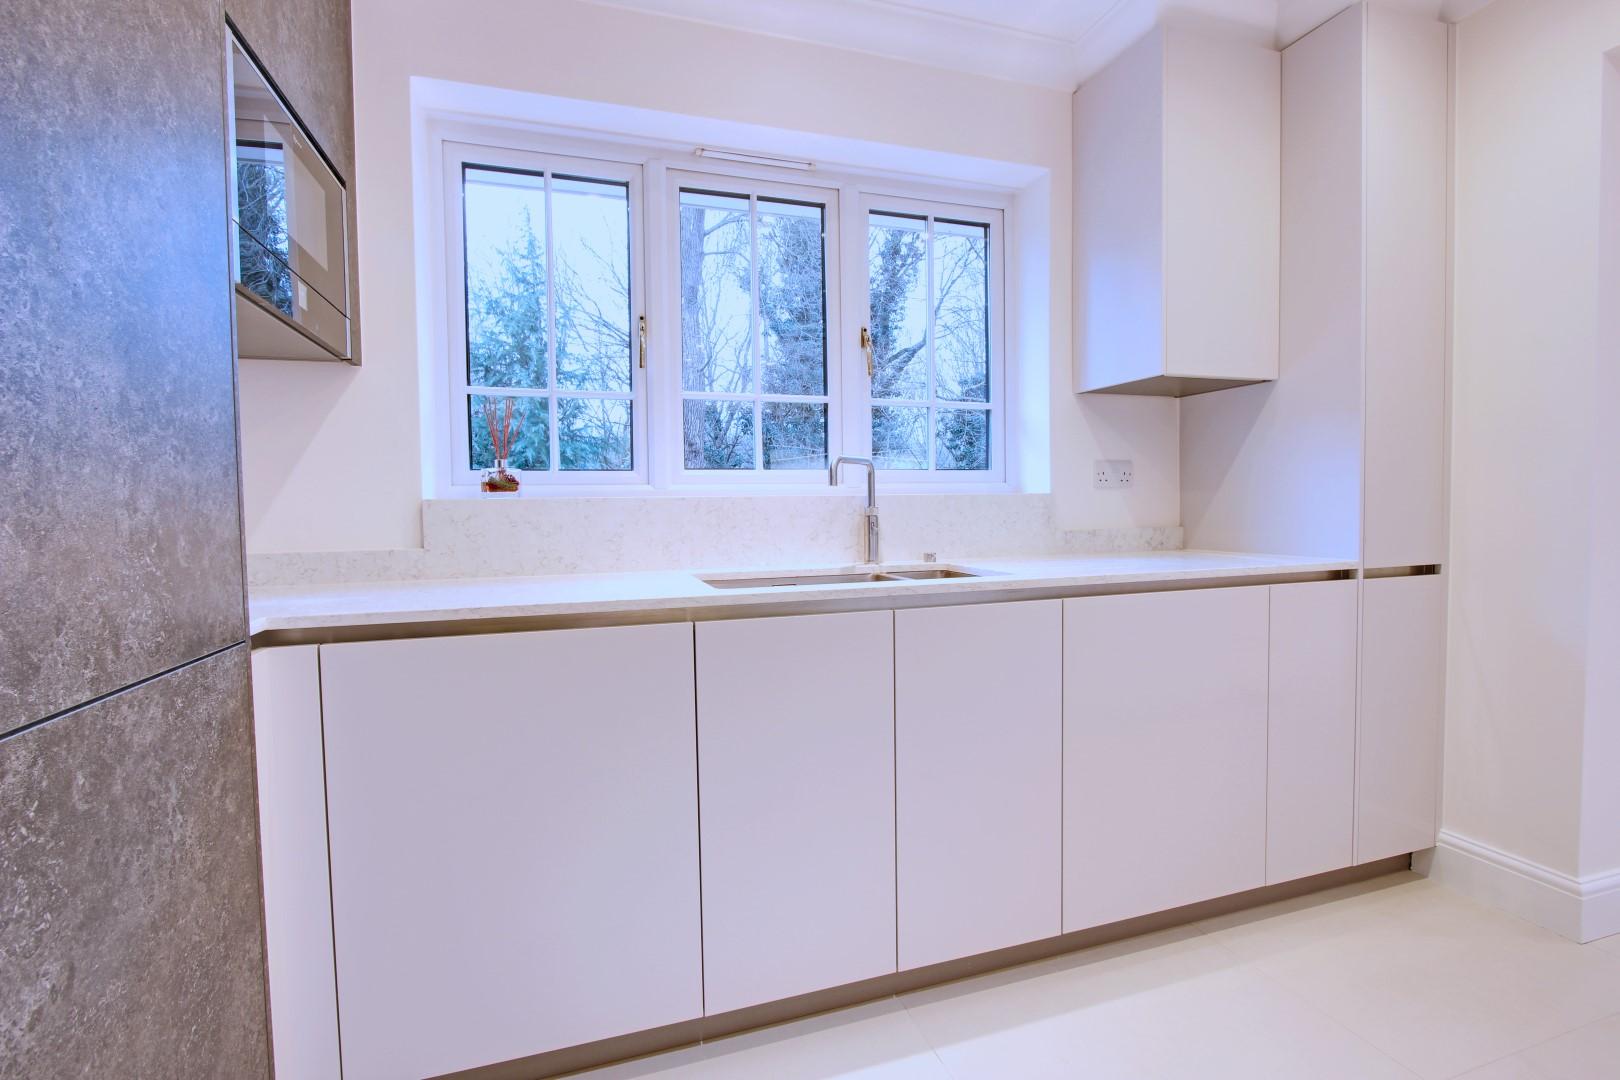 Matt Taupe & Slate - Northwood HA6   Blax Kitchens Ltd